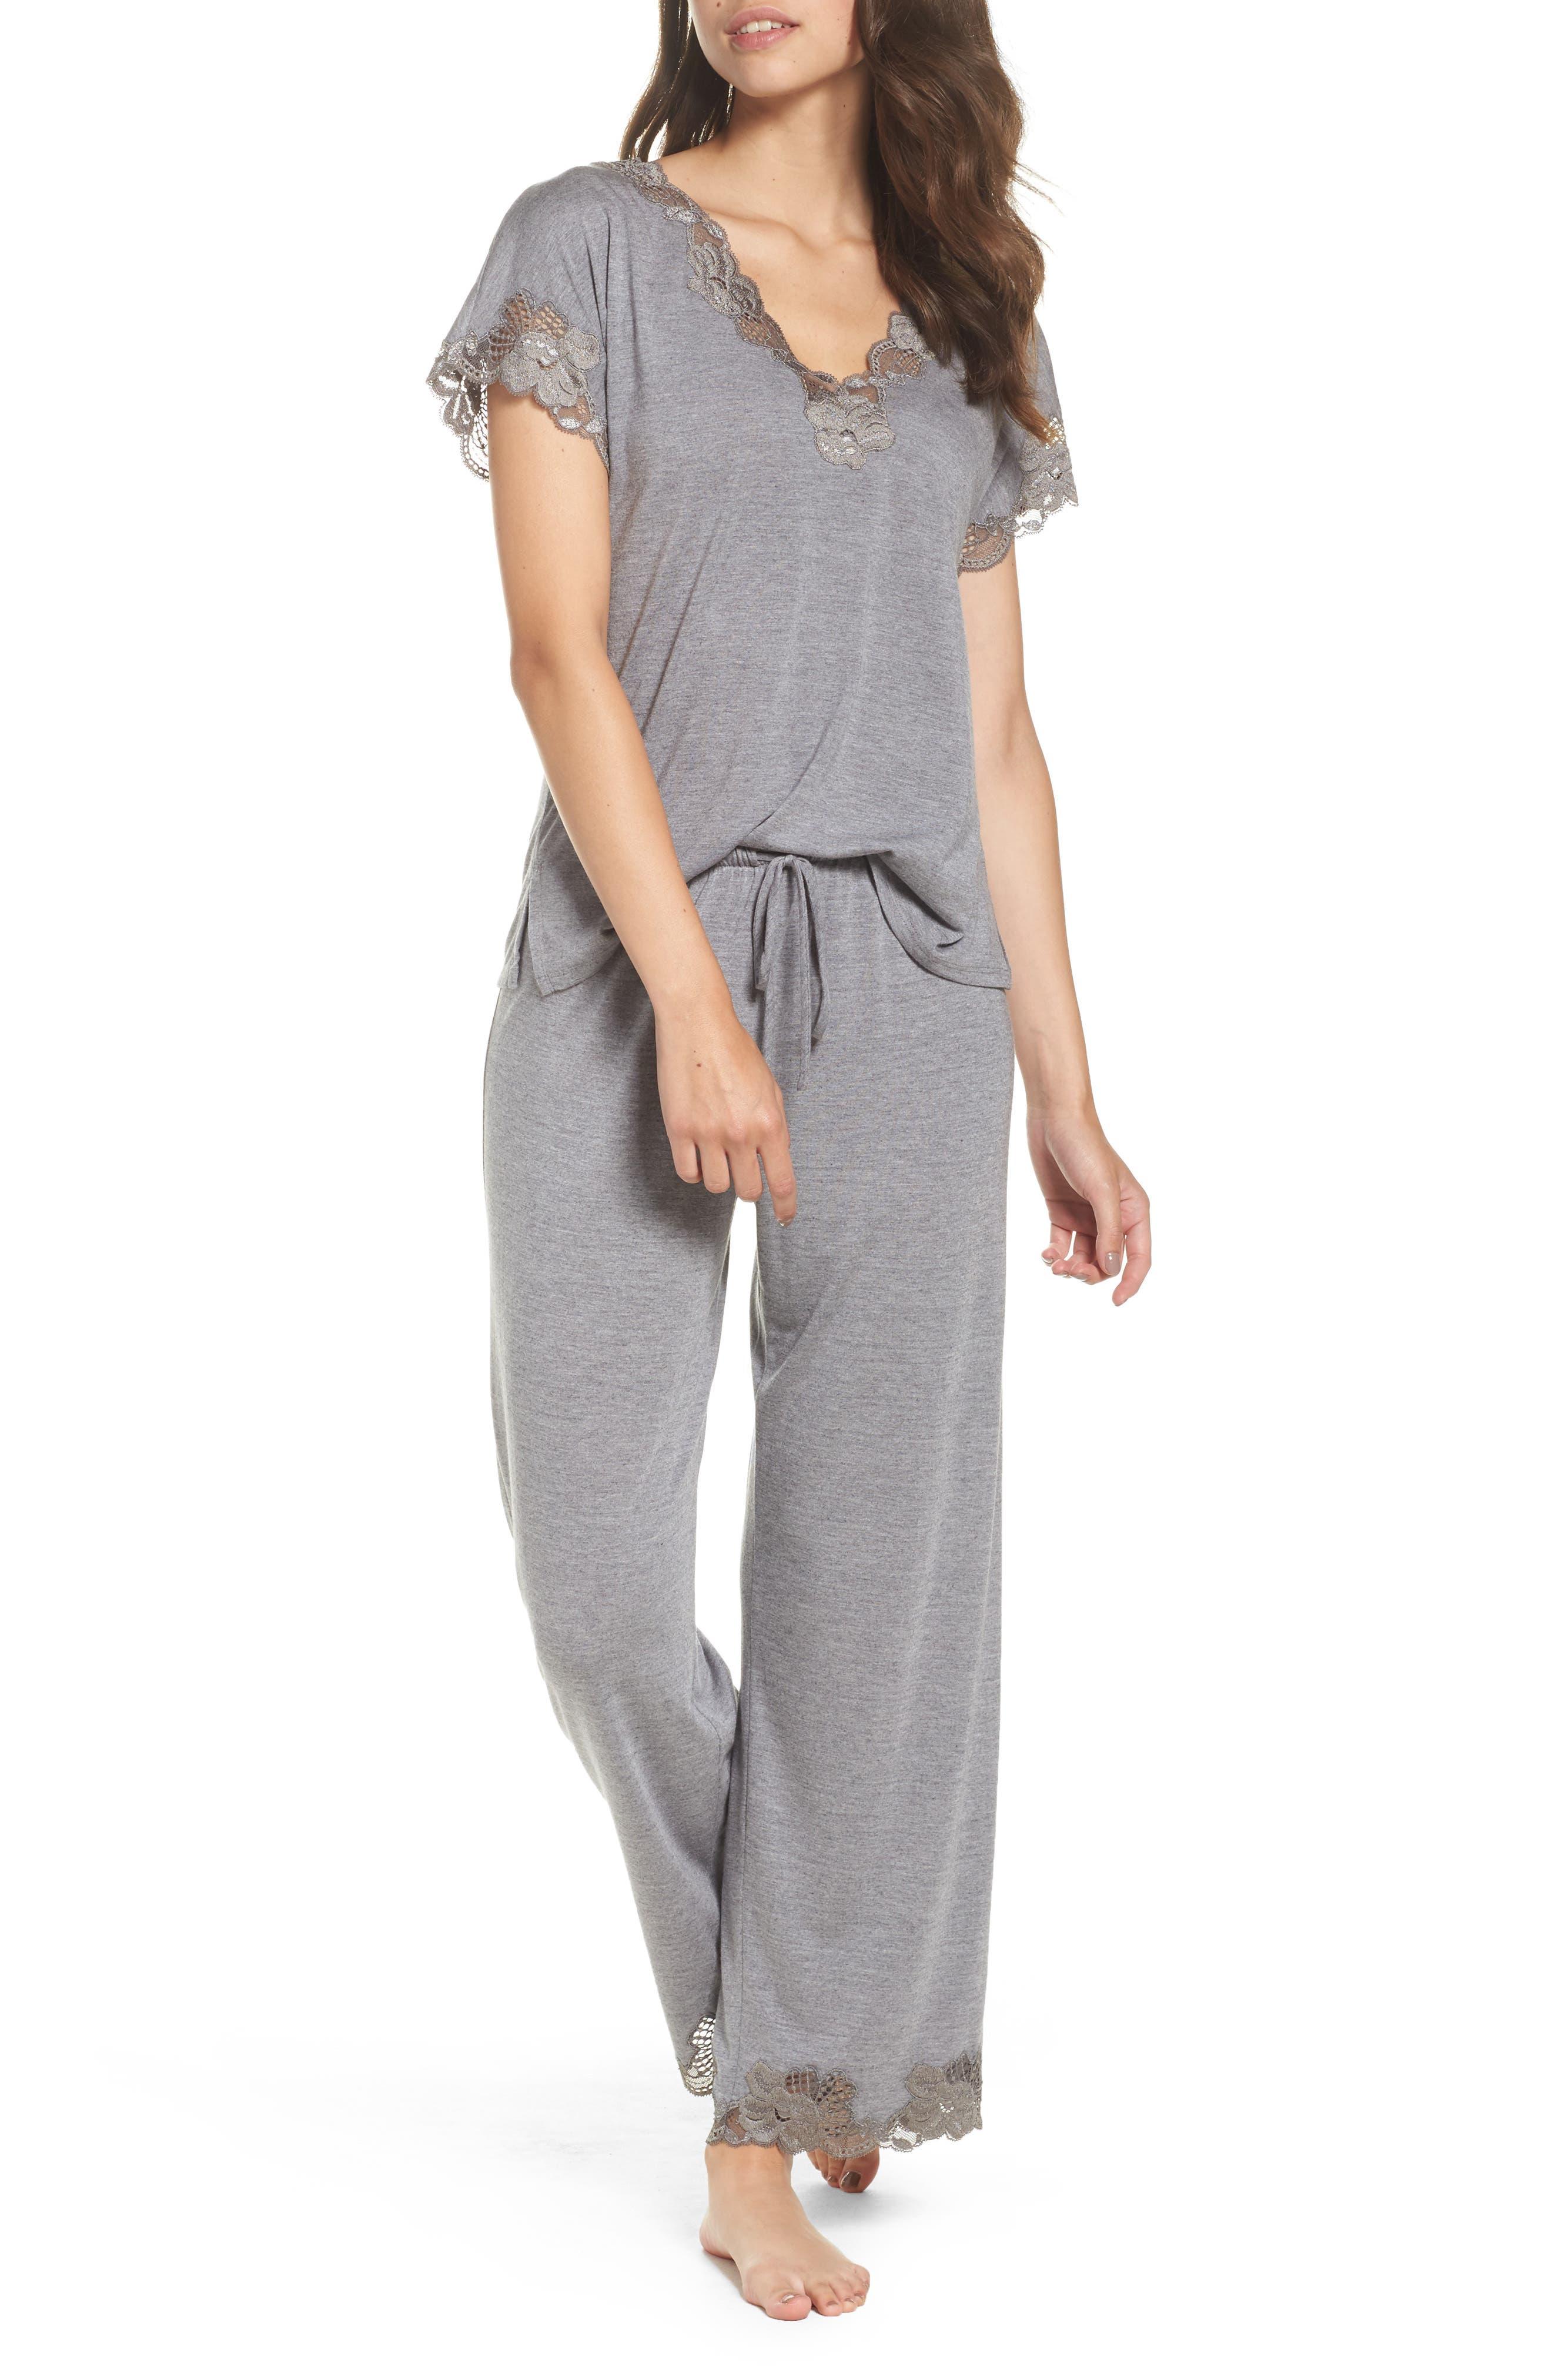 NATORI 'Zen Floral' Pajama Set, Main, color, 051